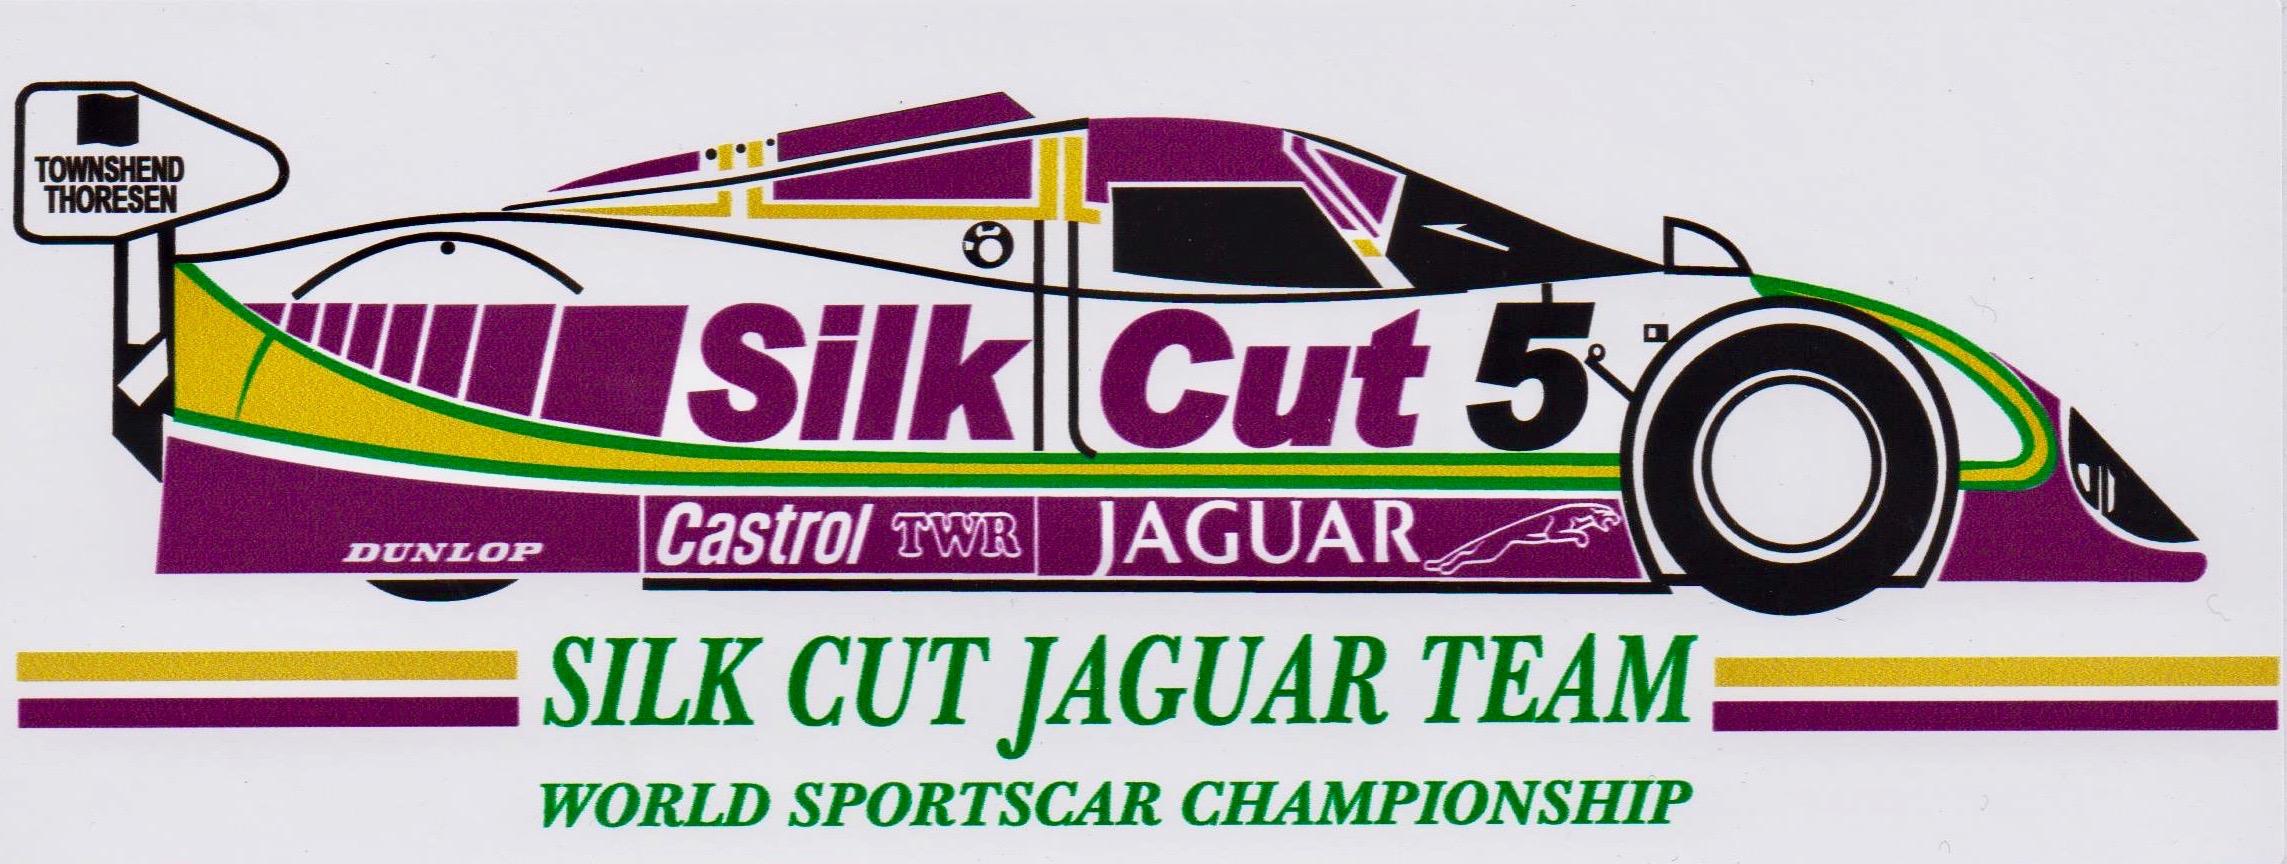 Jaguar Silk Cut Le Mans XJR15 Sportscar Sticker